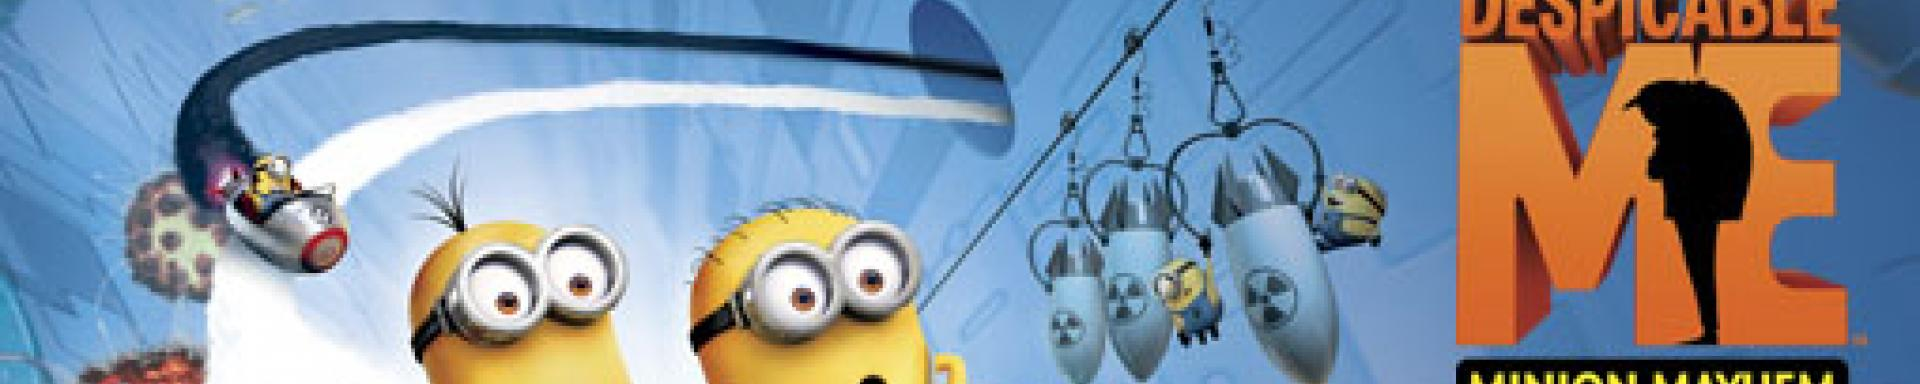 Universal Studios Hollywood - Buche 1 Tag, bekomme den 2. gratis!